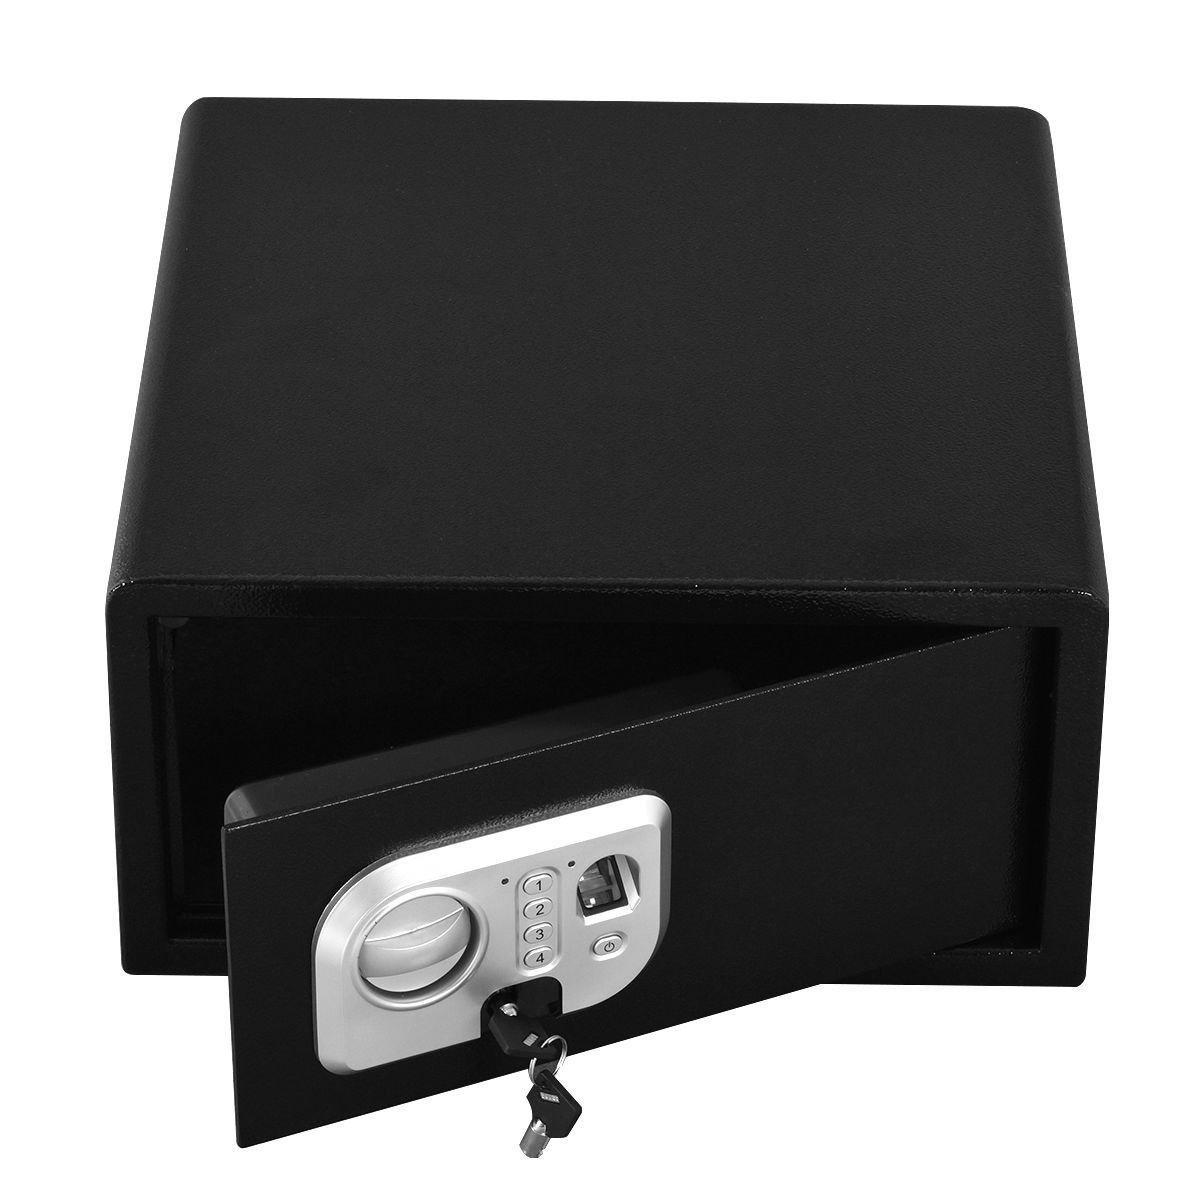 15.7'' Biometric Fingerprint Digital Electronic Gun Safe Keypad Lock Security by Storend